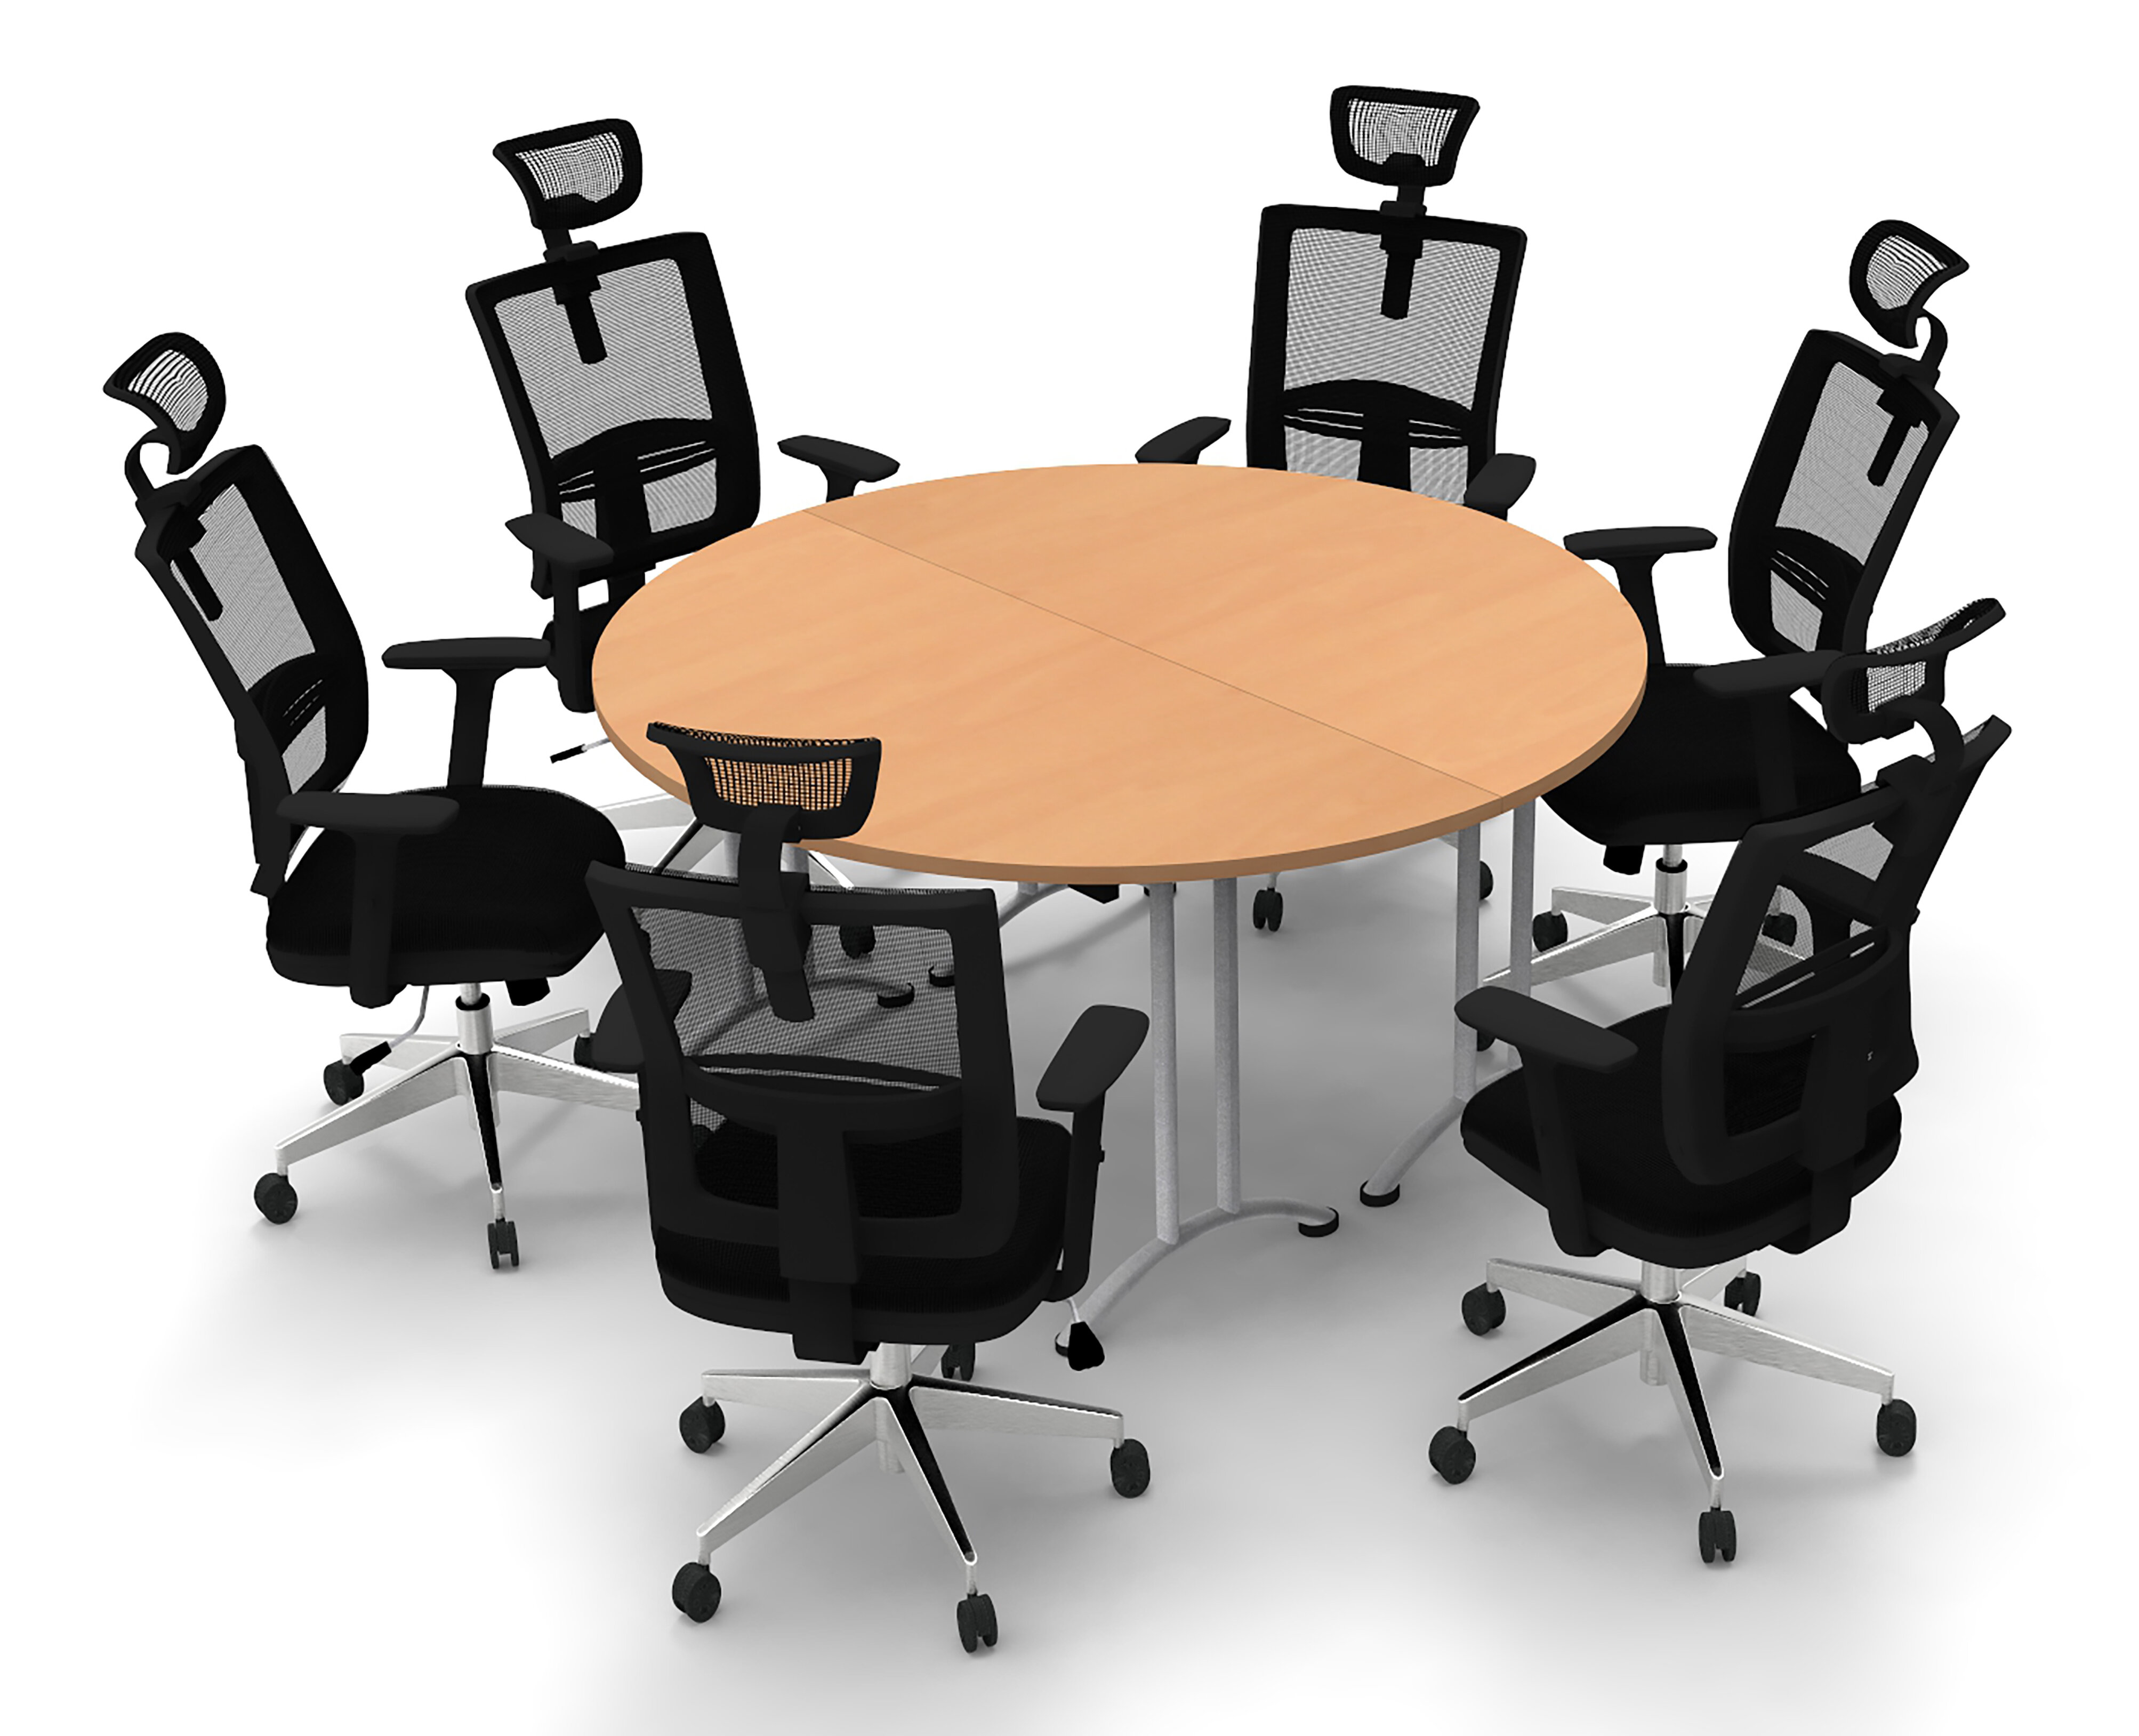 Symple Stuff Hagar Circular Conference Table and Chair Set | Wayfair